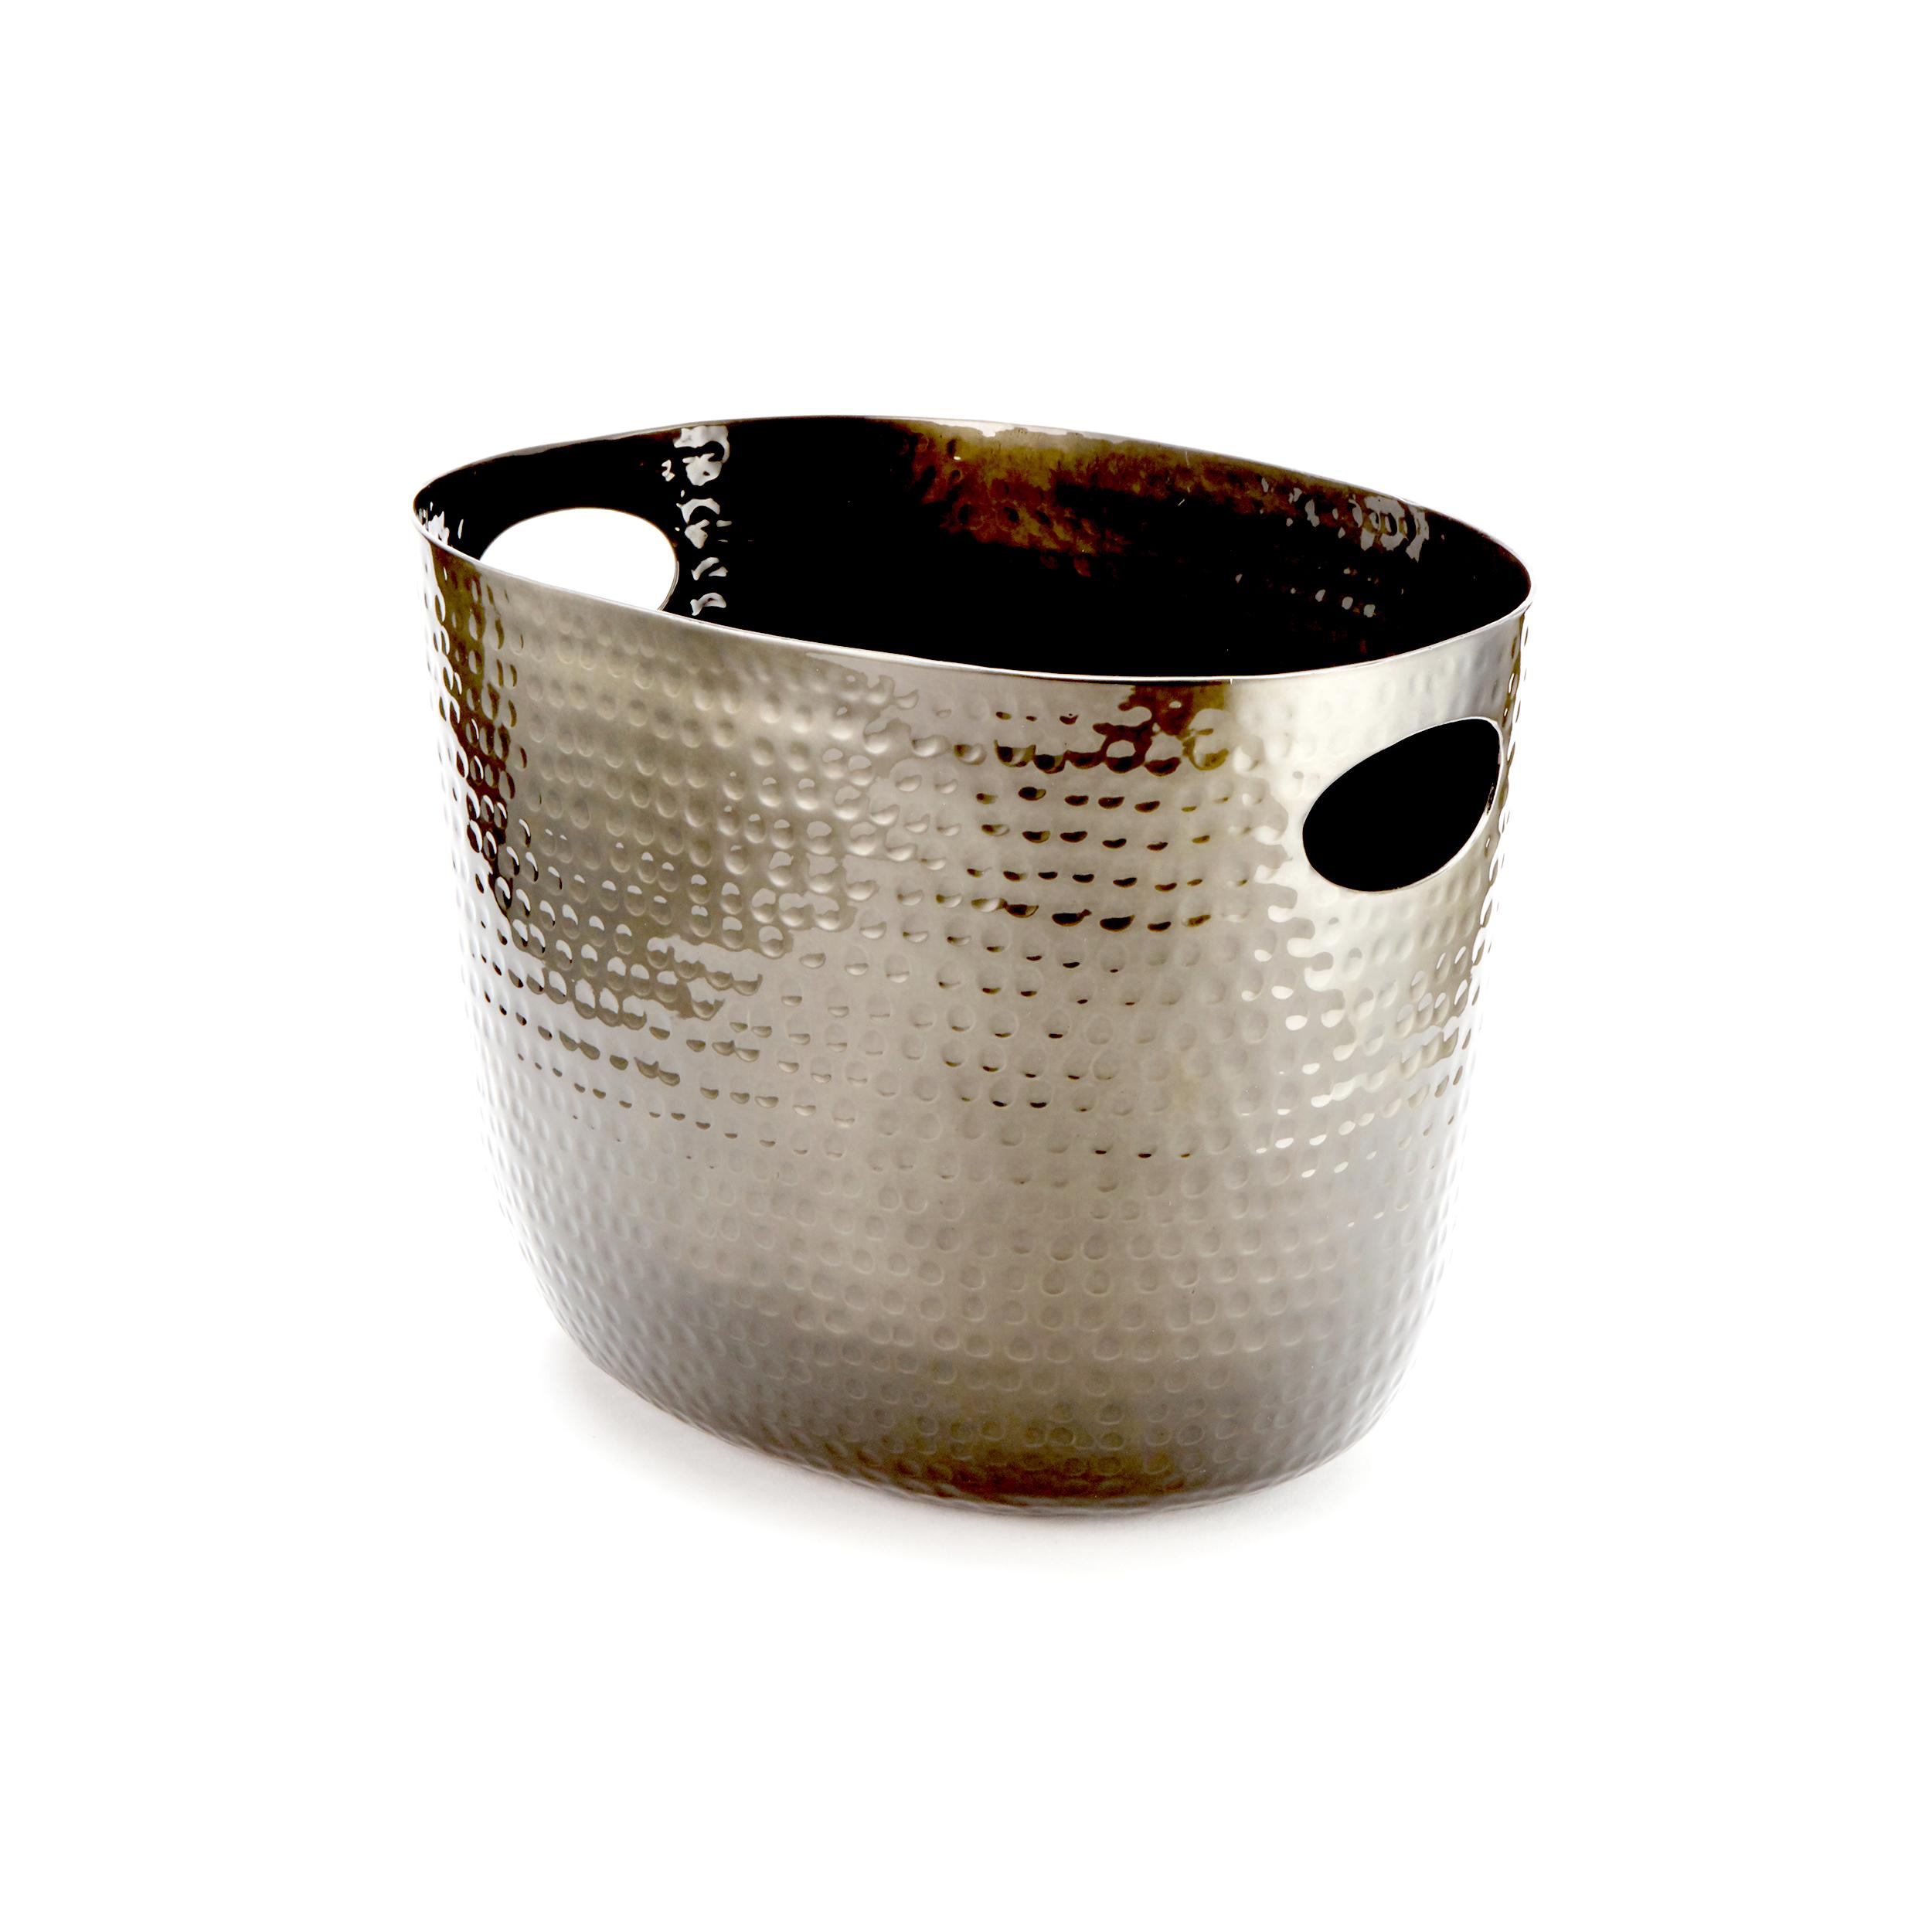 American Metalcraft ATHB9 beverage / ice tub